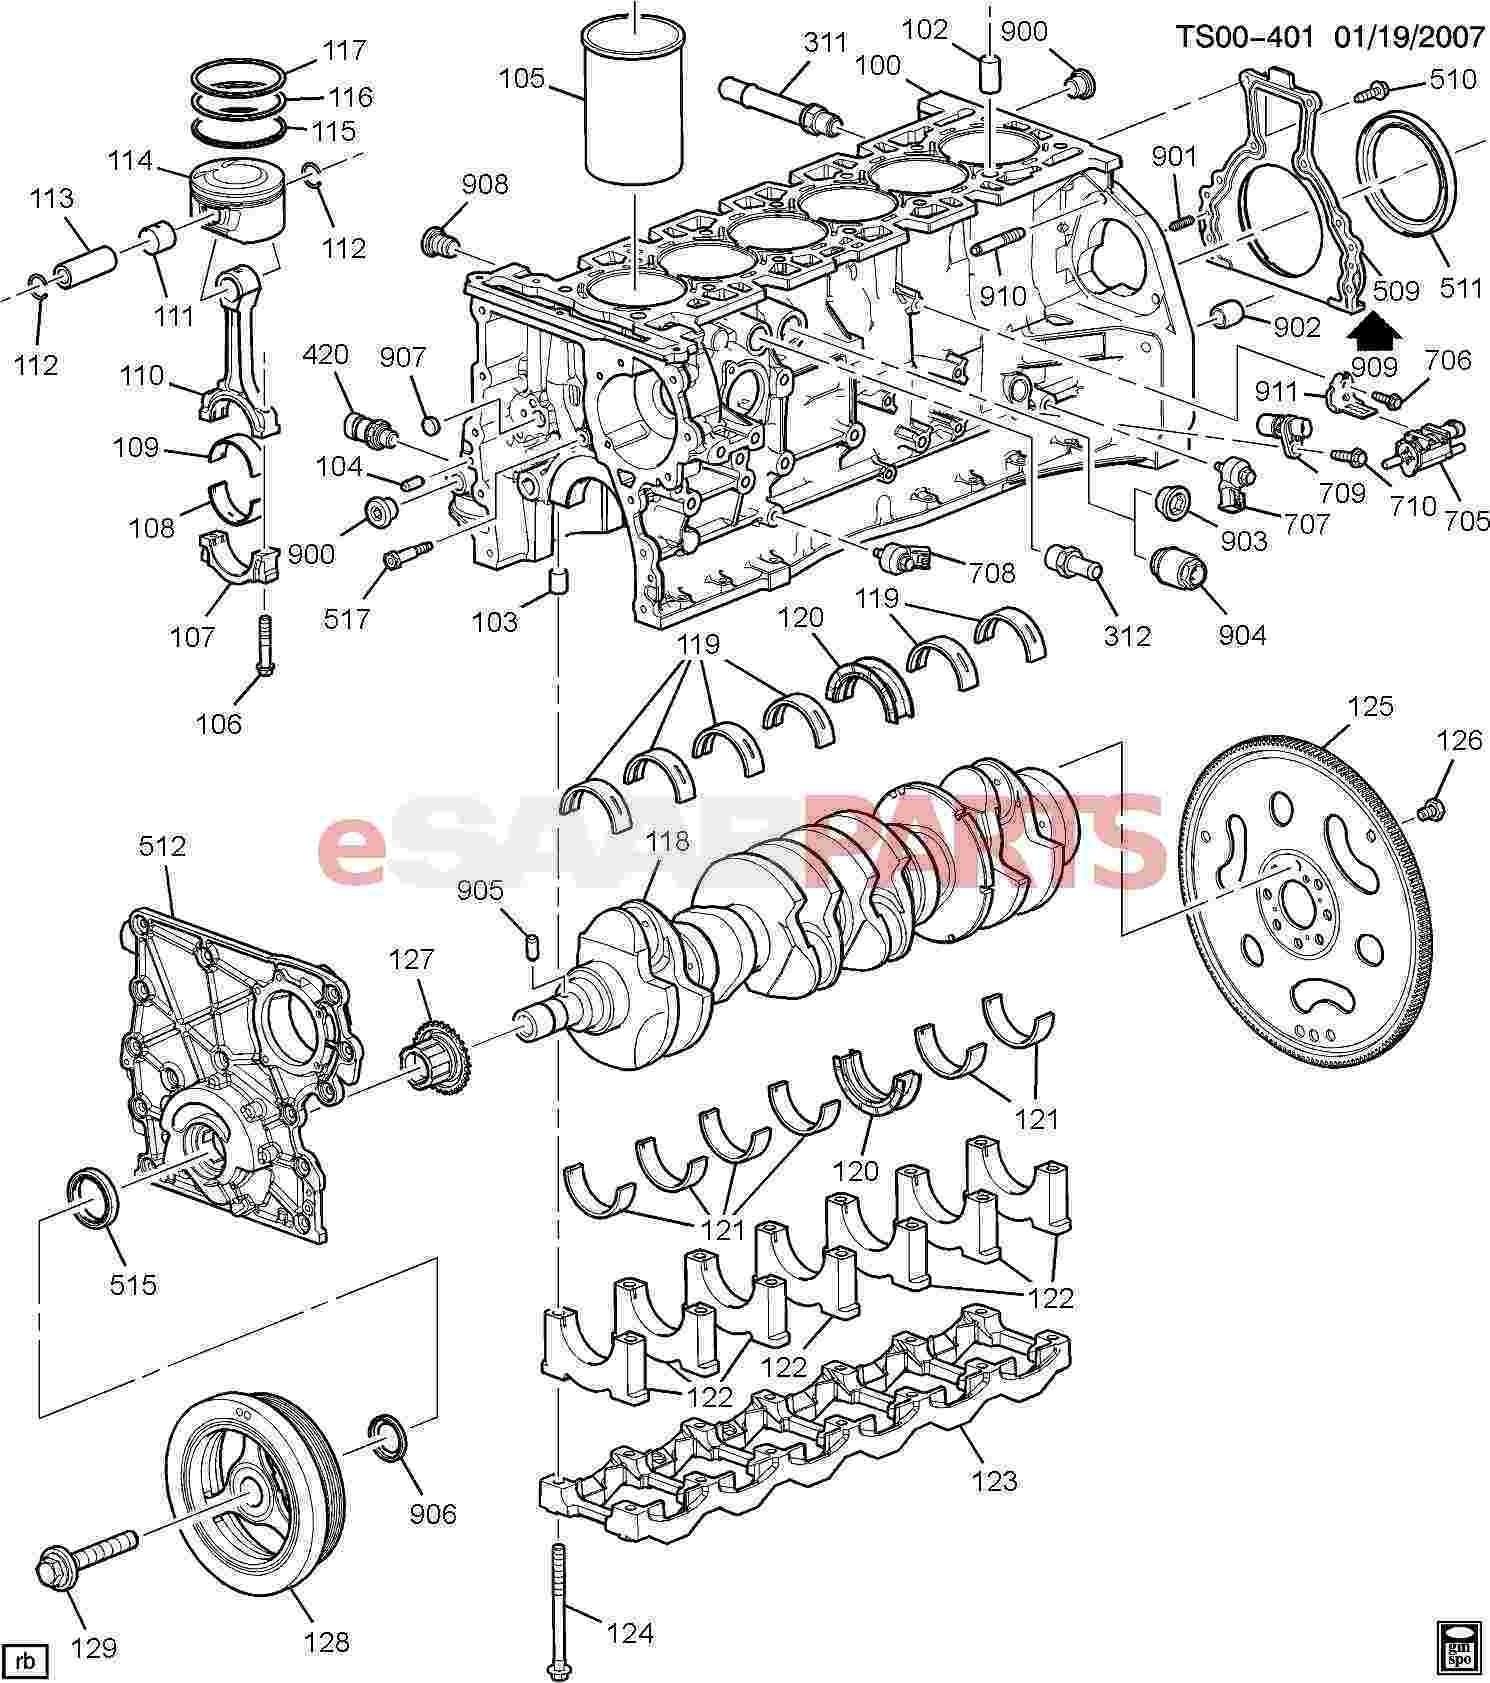 hight resolution of lexus es300 engine diagram auto engine parts diagram of lexus es300 engine diagram 98 toyota ta